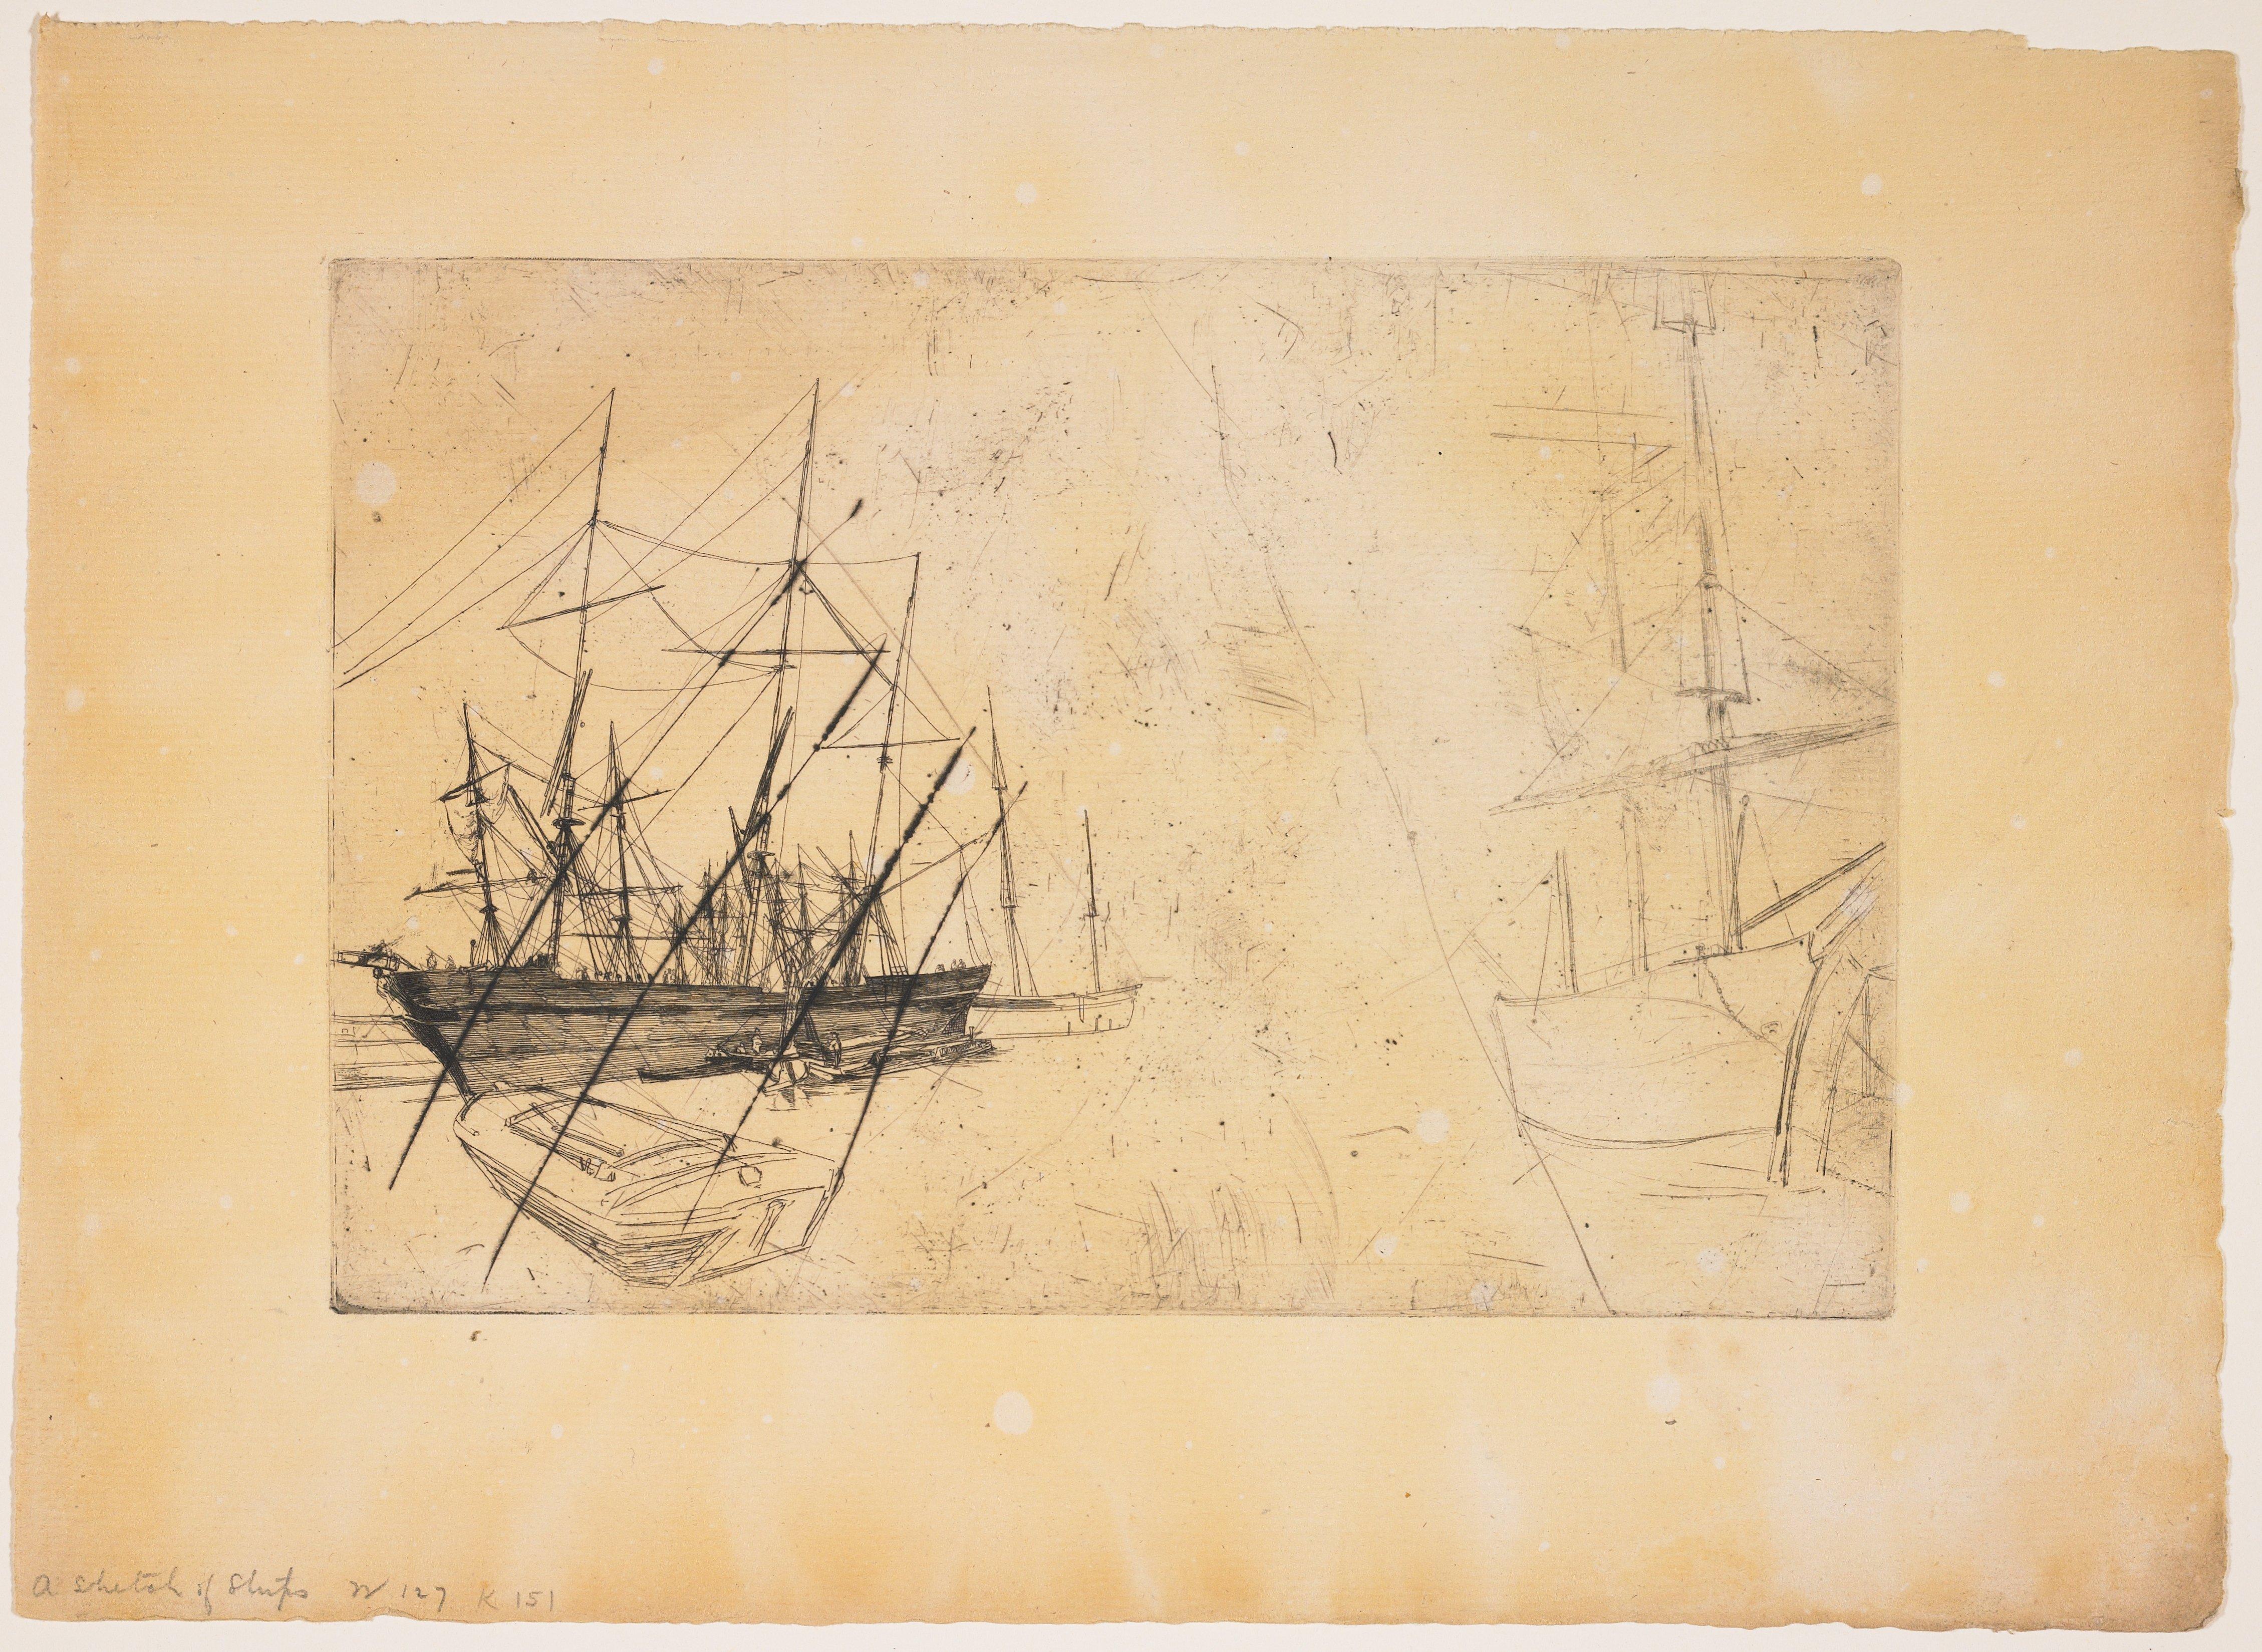 Sketch of Ships, James McNeill Whistler | Mia